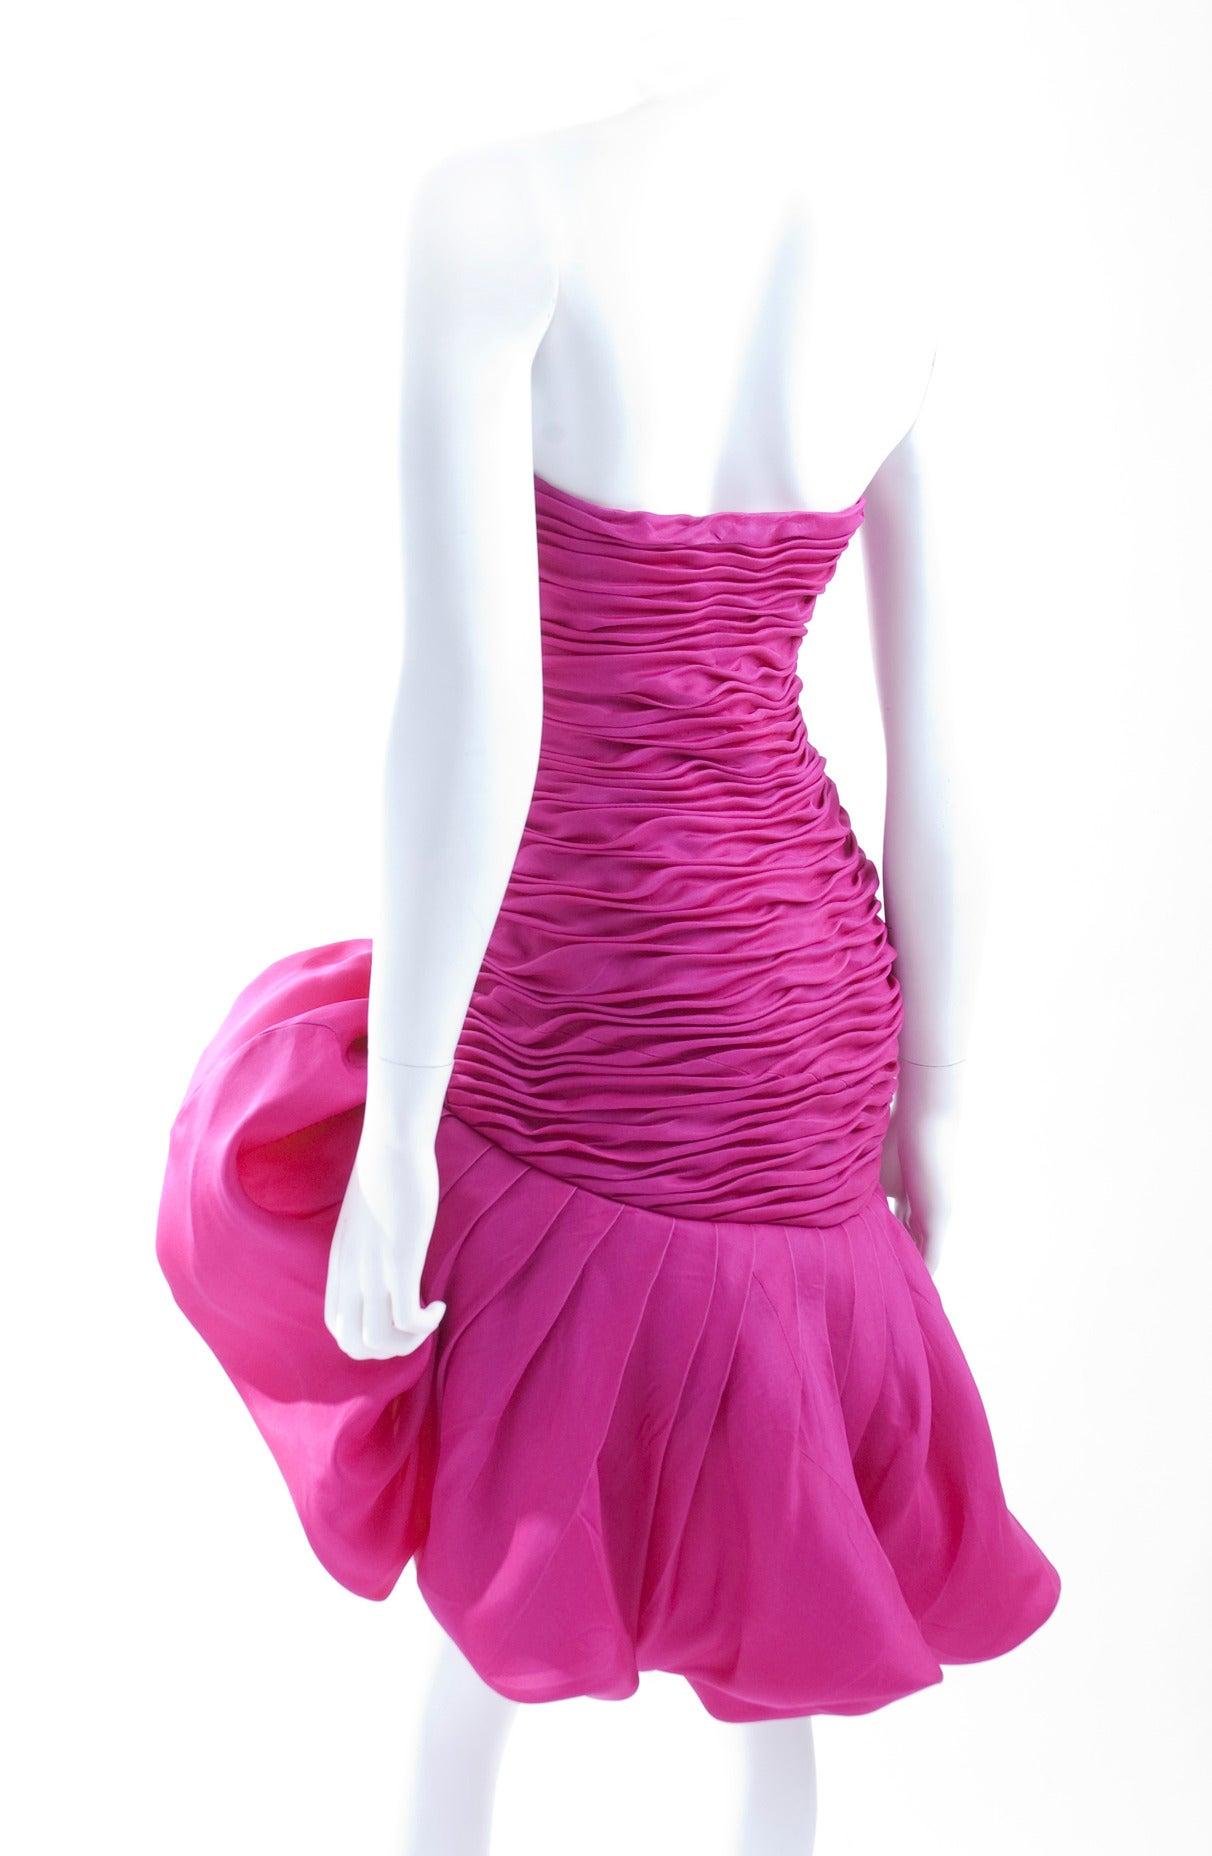 Emanuel Ungaro Parallele Paris Cocktail Dress 7